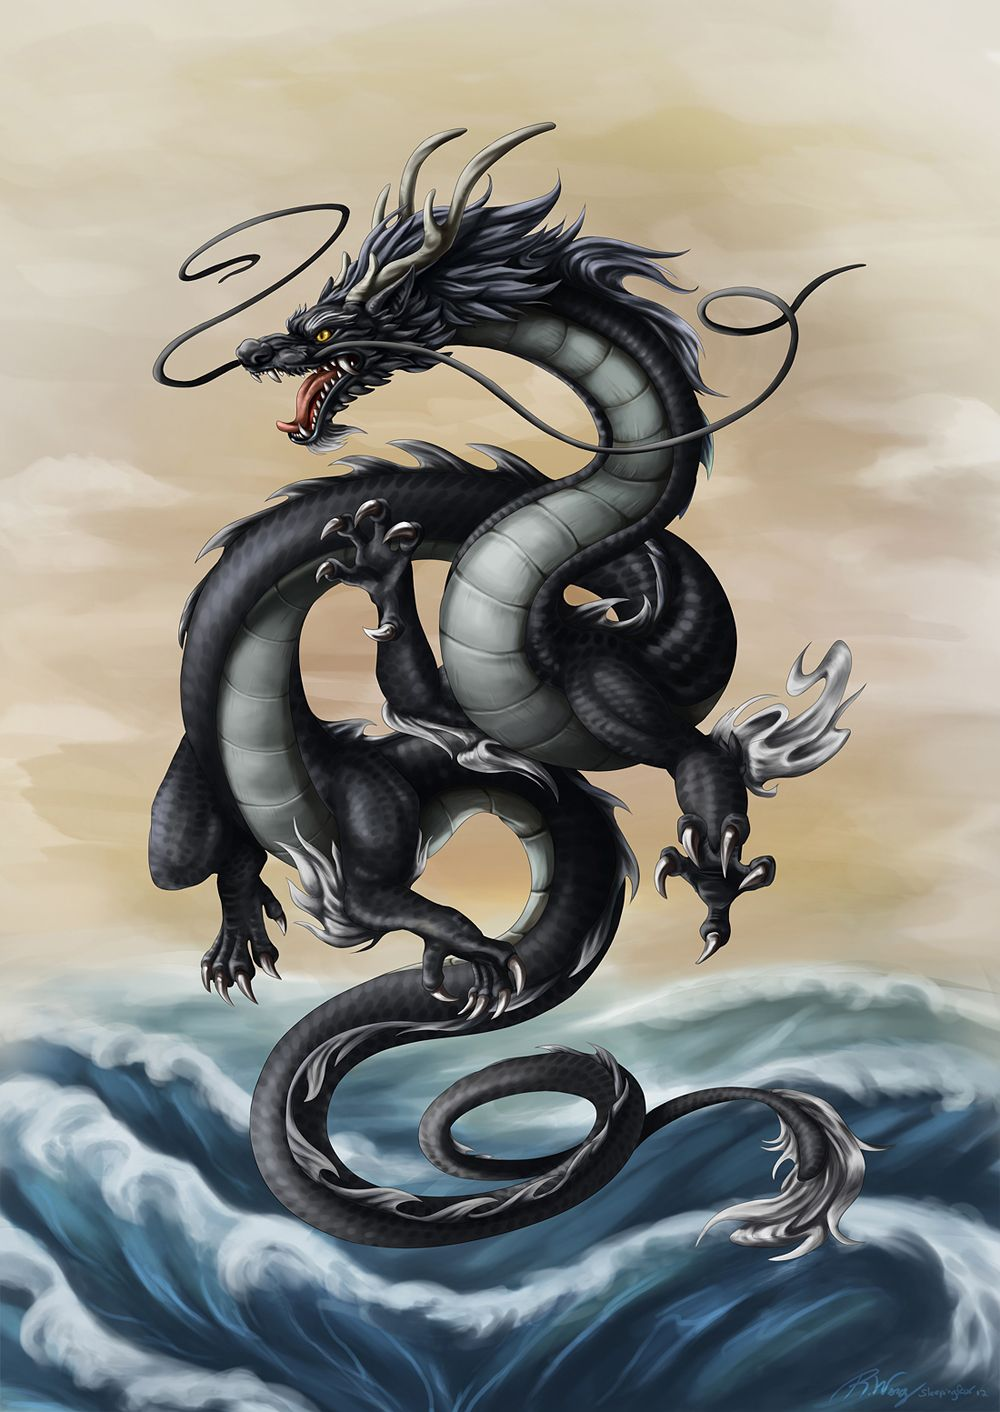 pingl par kathrine nadeau sur henri 39 s favorite dragon chinese dragon et dragon art. Black Bedroom Furniture Sets. Home Design Ideas